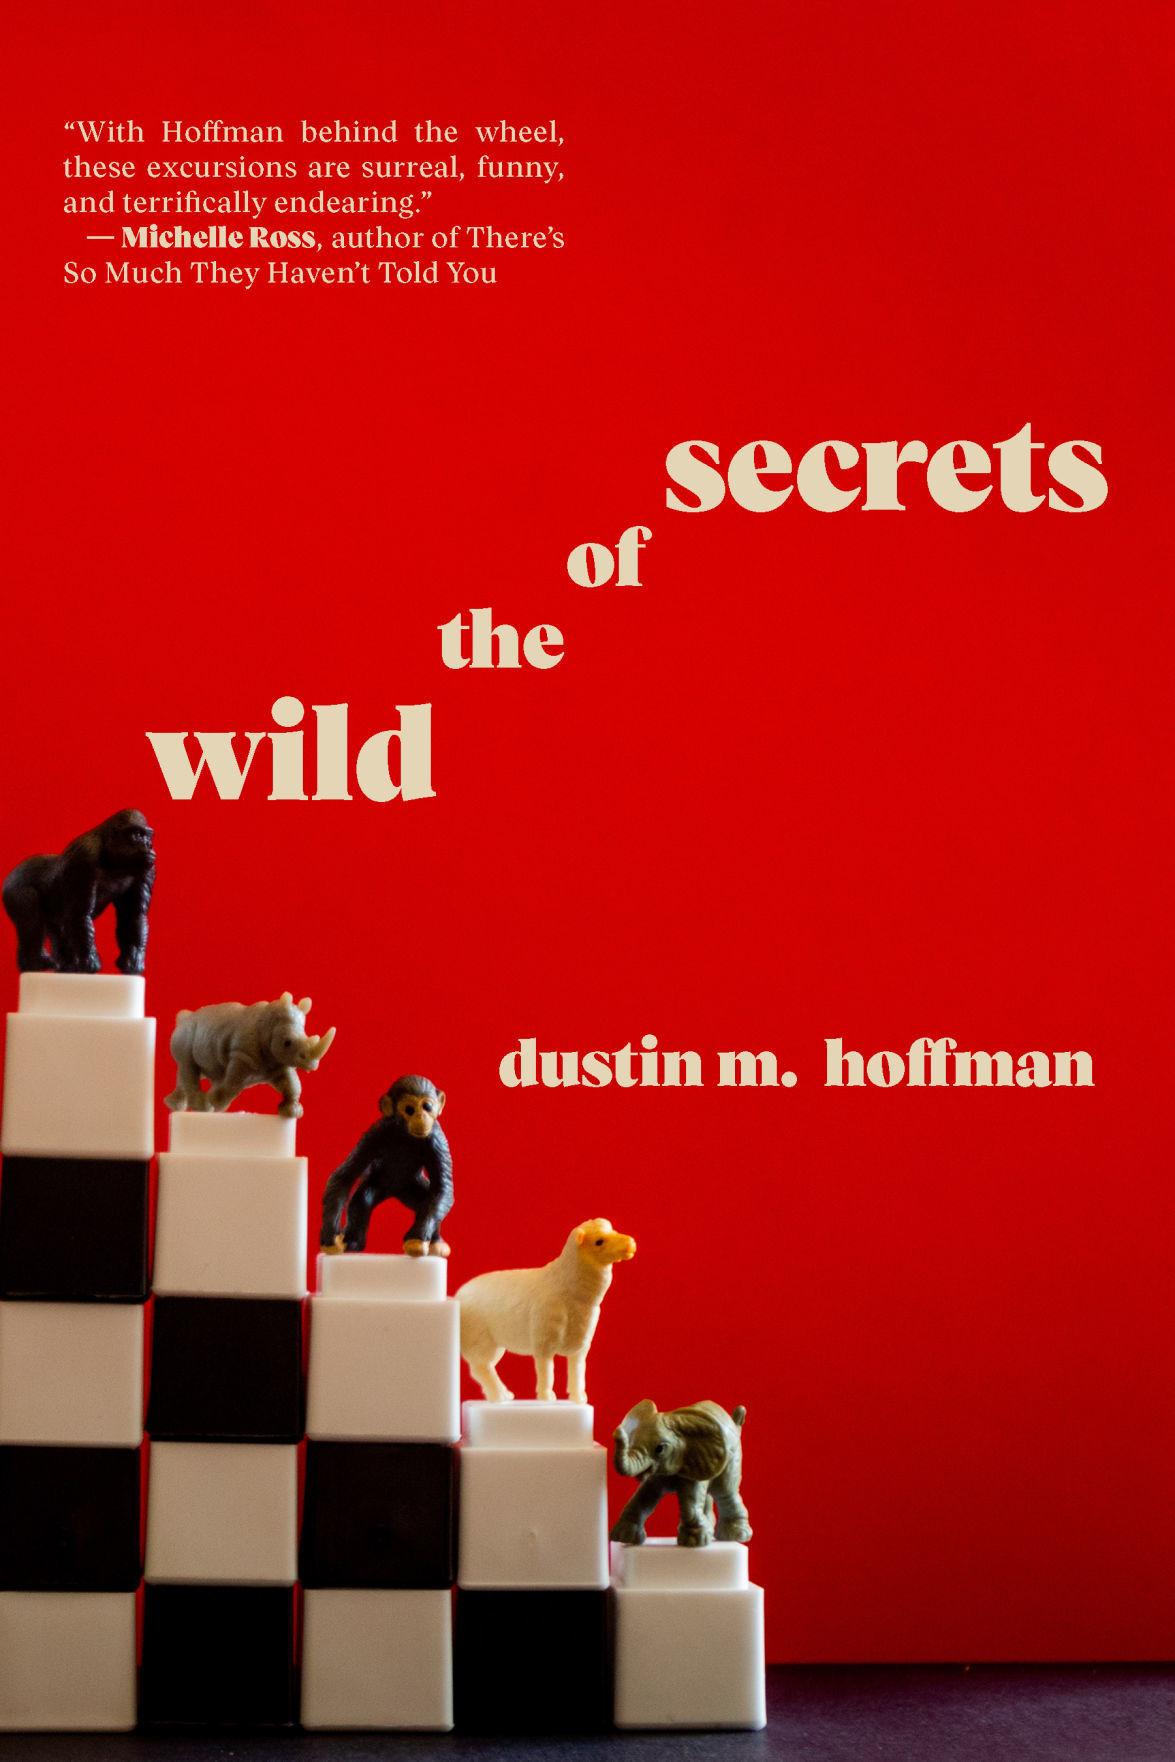 Dustin M. Hoffman